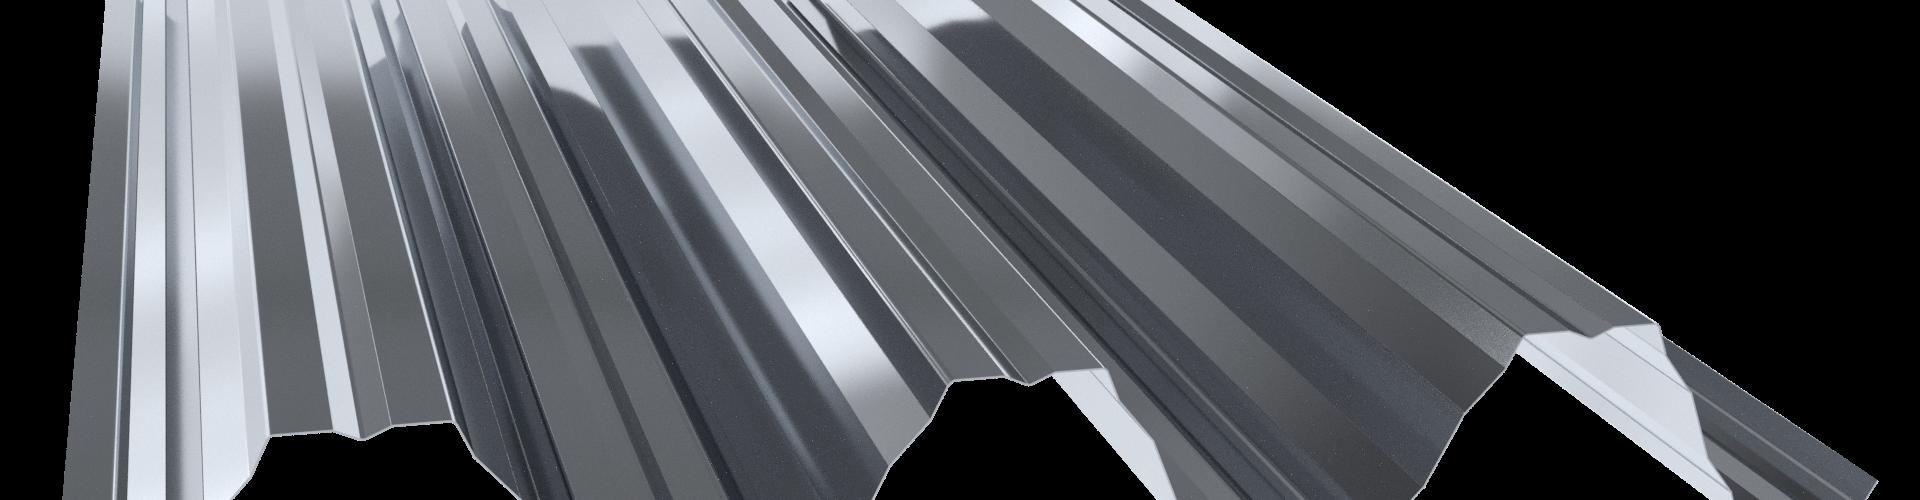 Konstruktionsprofil T130